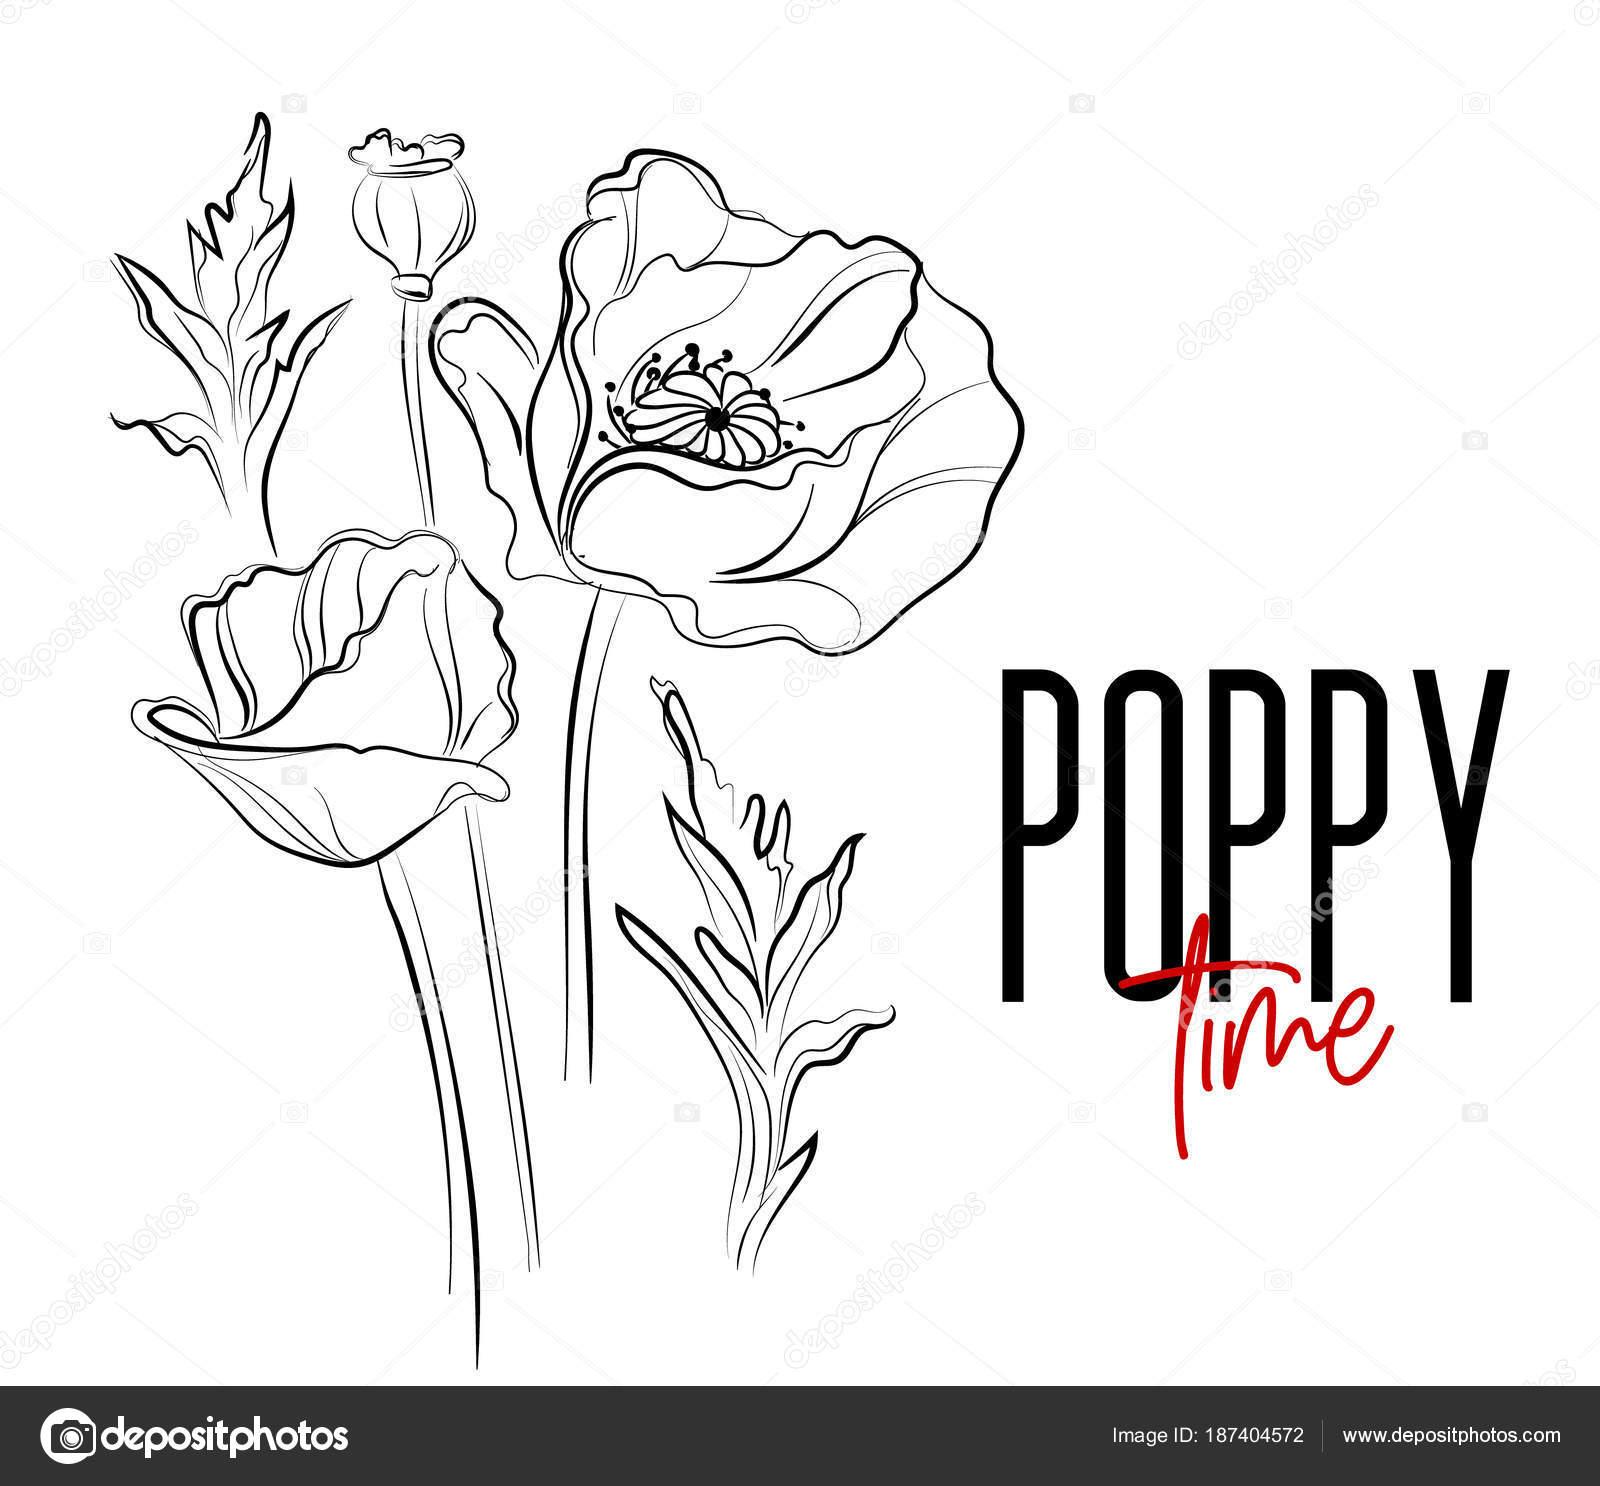 Vector poppy flowers decorative print nature flowers black white vector poppy flowers decorative print nature flowers black white illustration poppier bloom summer plants mightylinksfo